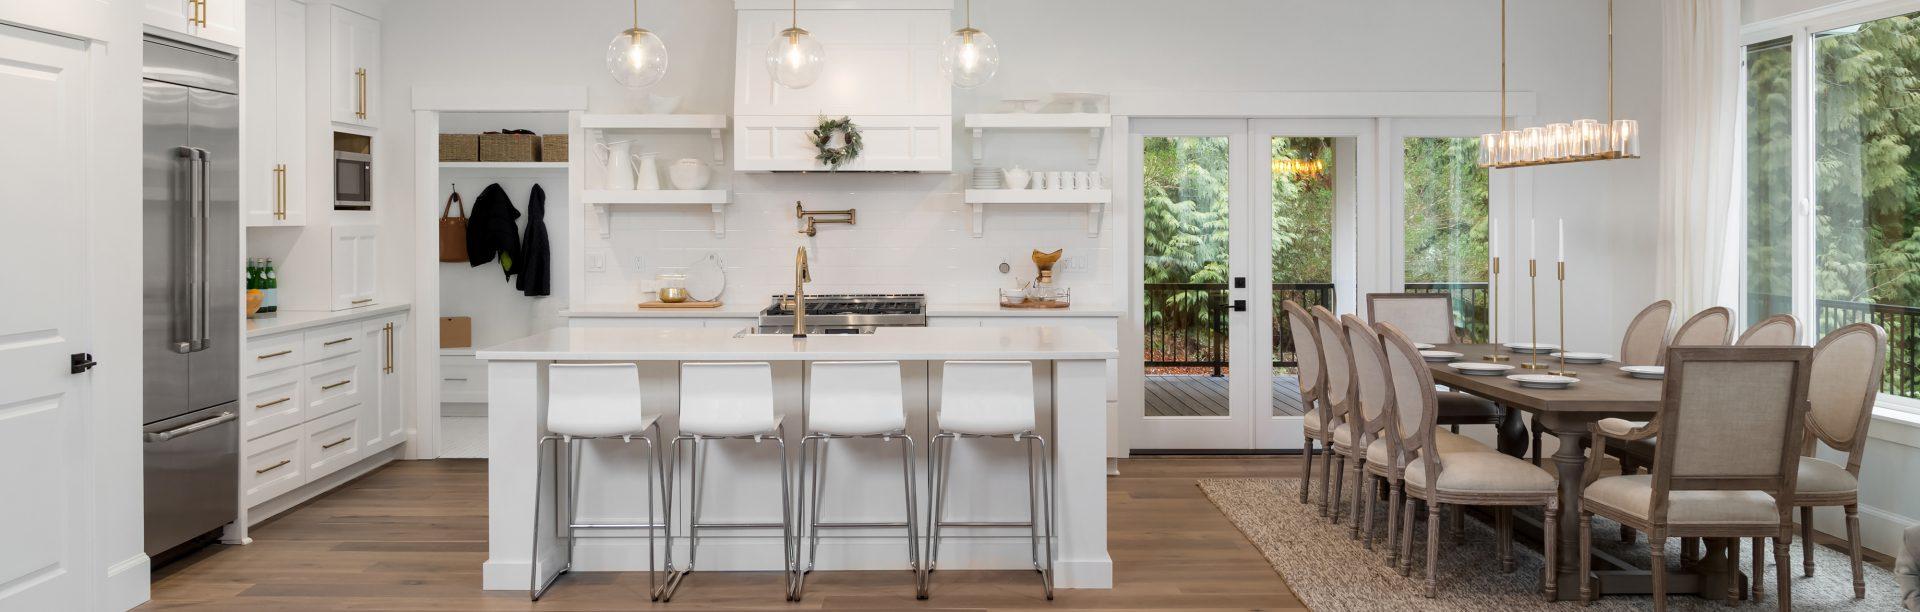 white kitchen with light hardwood floors